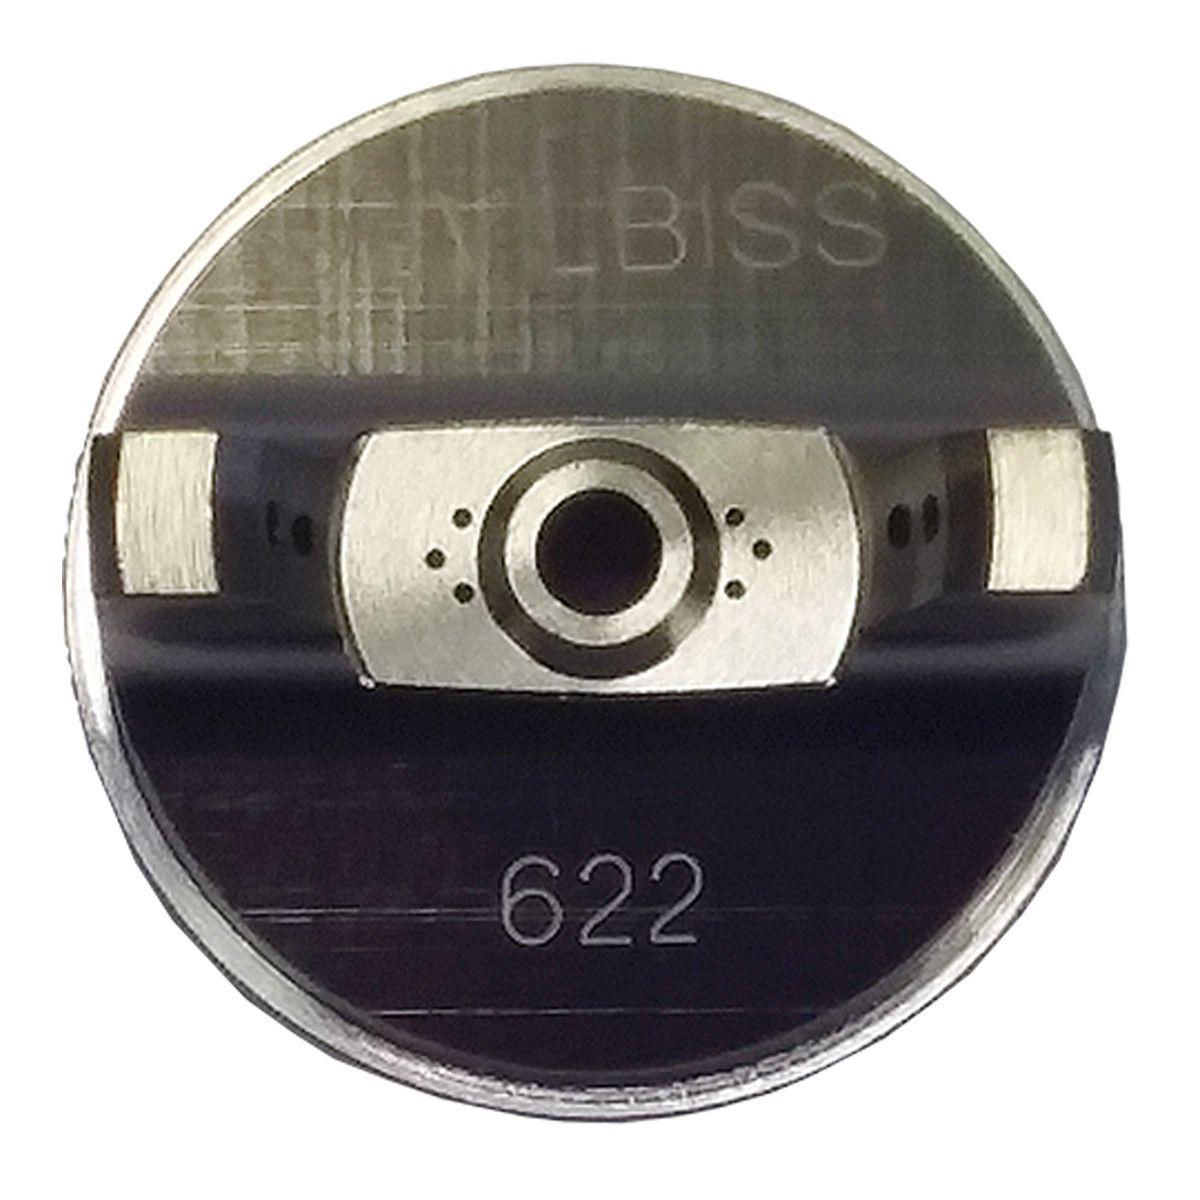 CAPA DE AR N 622 SGK-0053-622 DEVILBISS